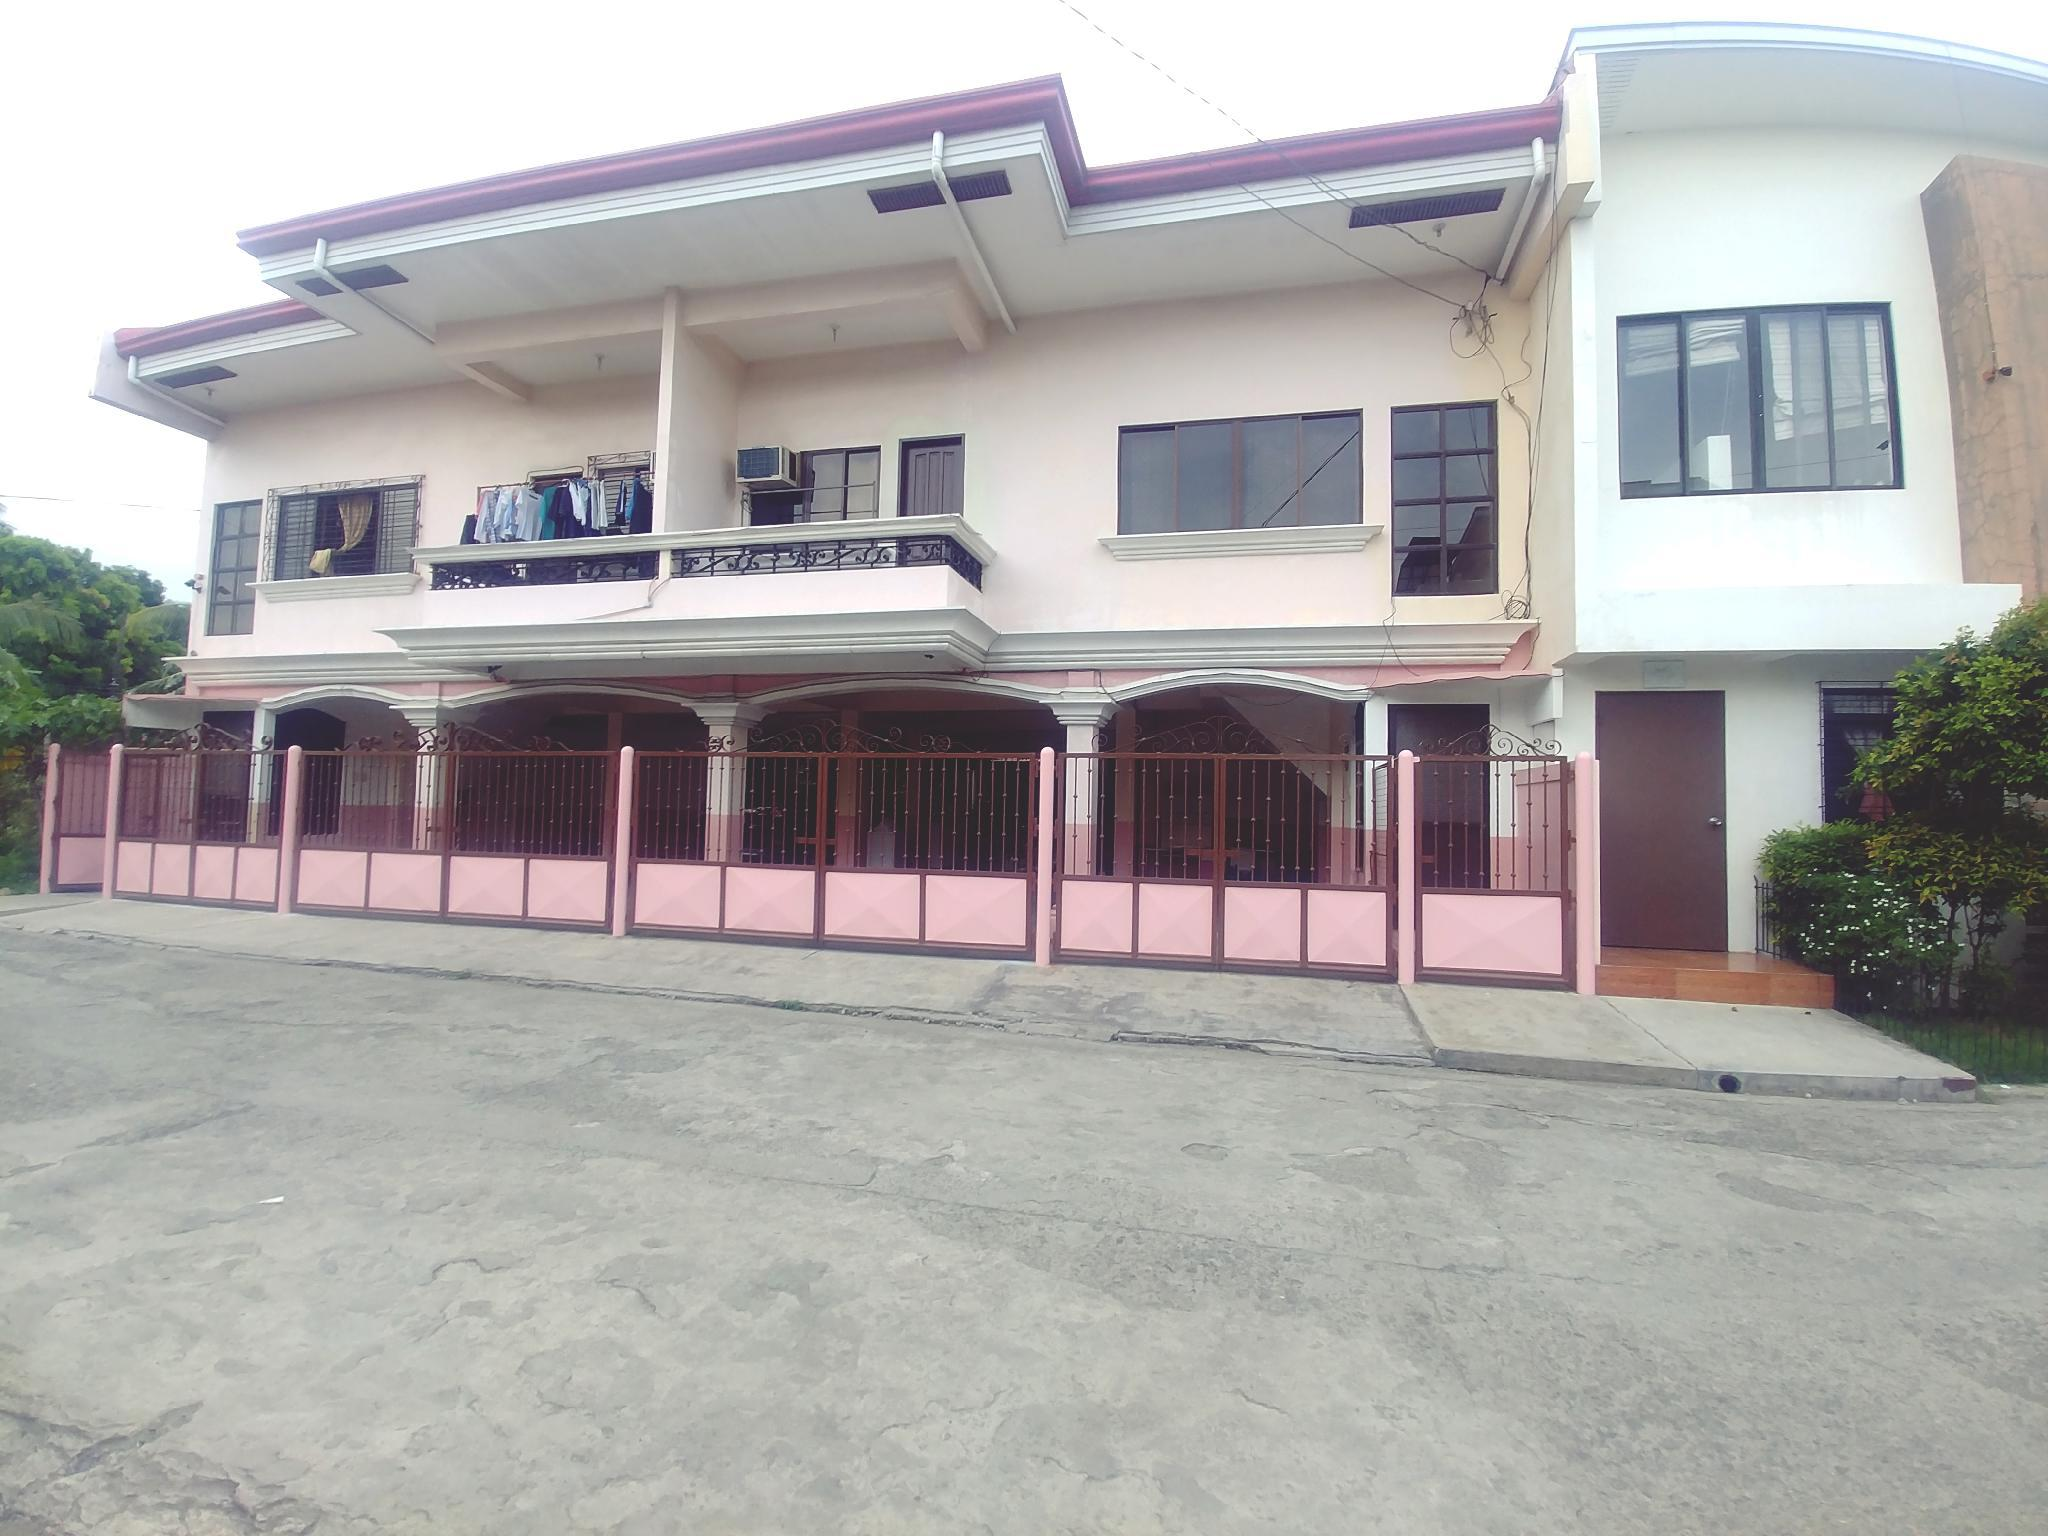 3-Bedroom Apartment, Iloilo City